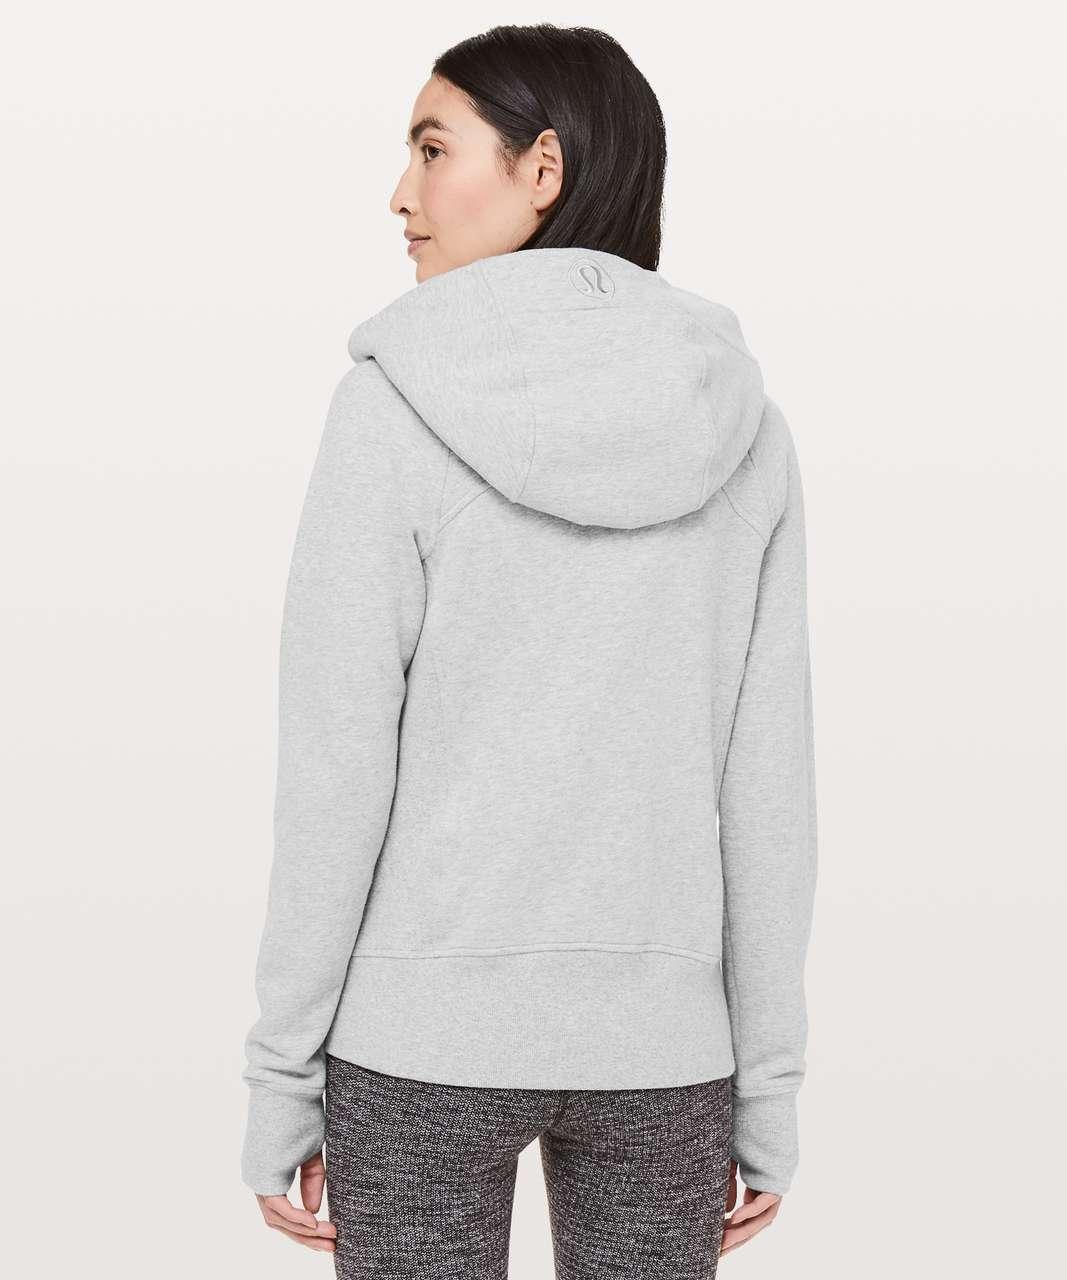 Lululemon Scuba Hoodie *Light Cotton Fleece - Heathered Core Light Grey / Silver Drop